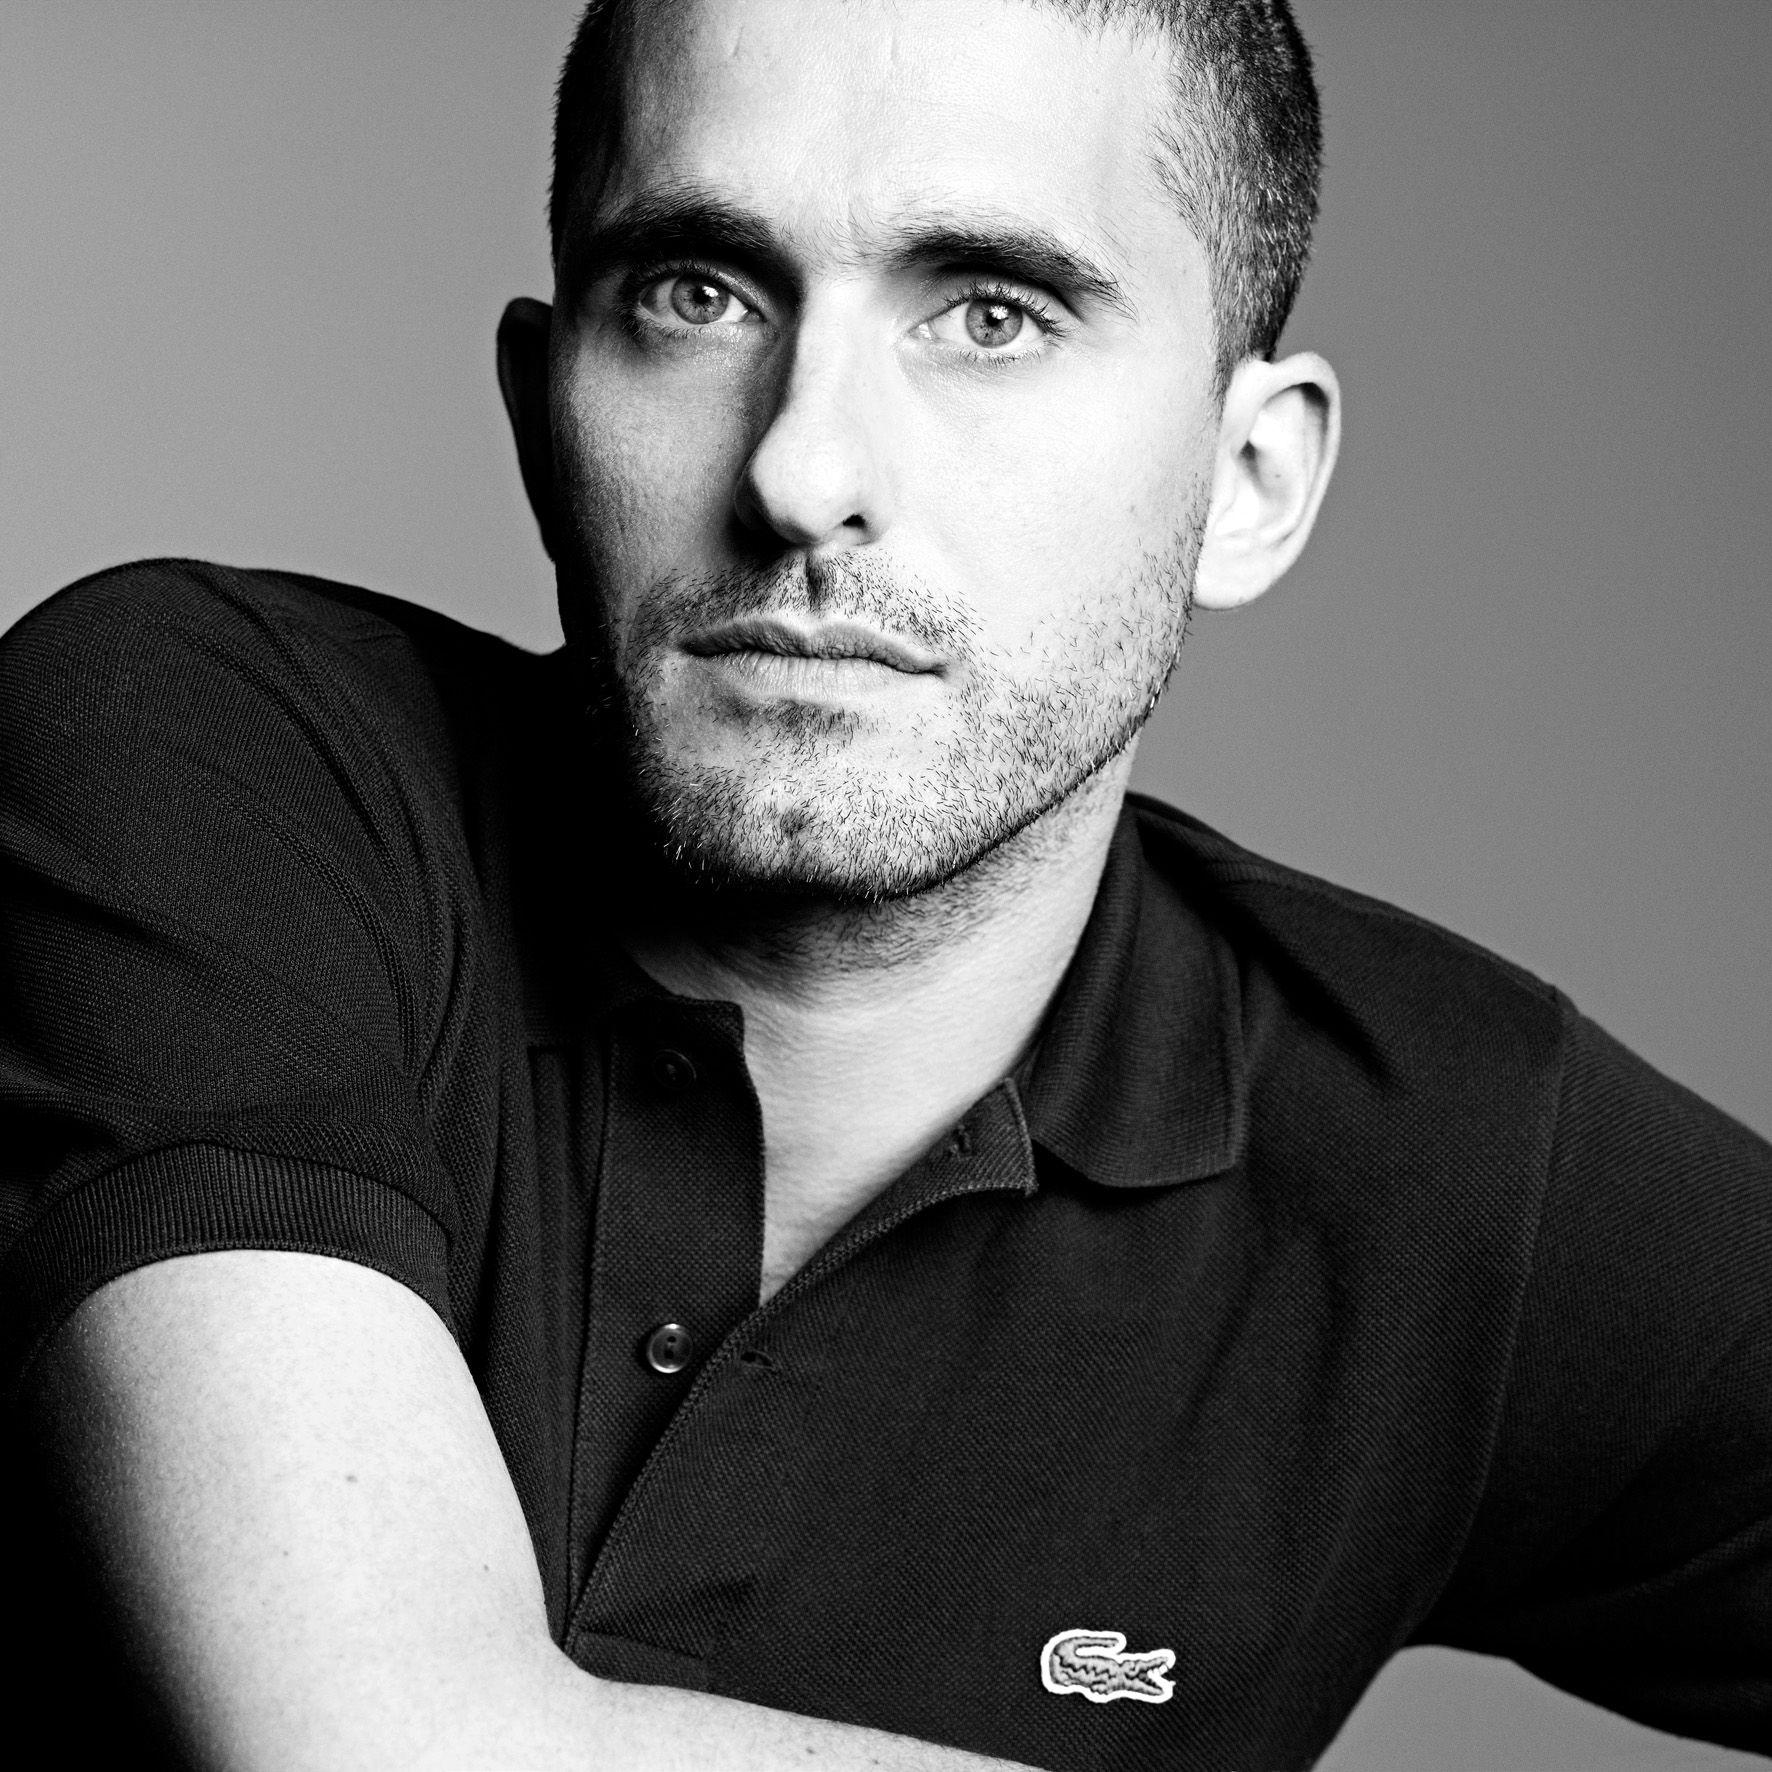 Felipe Oliveira Baptista va tenter de continuer l'image moderne et innovante créée par Kenzo